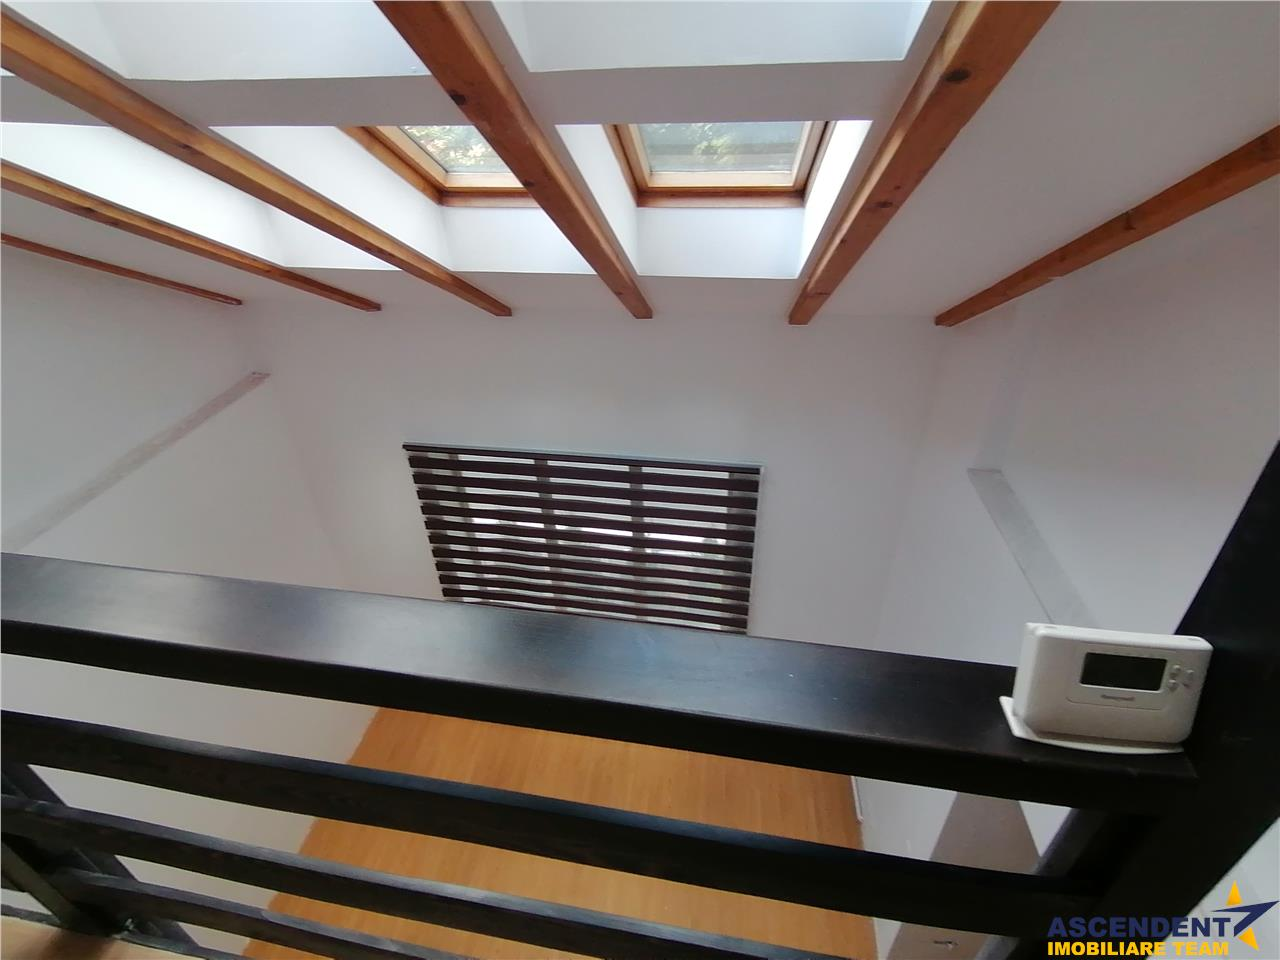 Constructie noua, potential apreciat, in incantare panoramica, Calea Poienii, Brasov